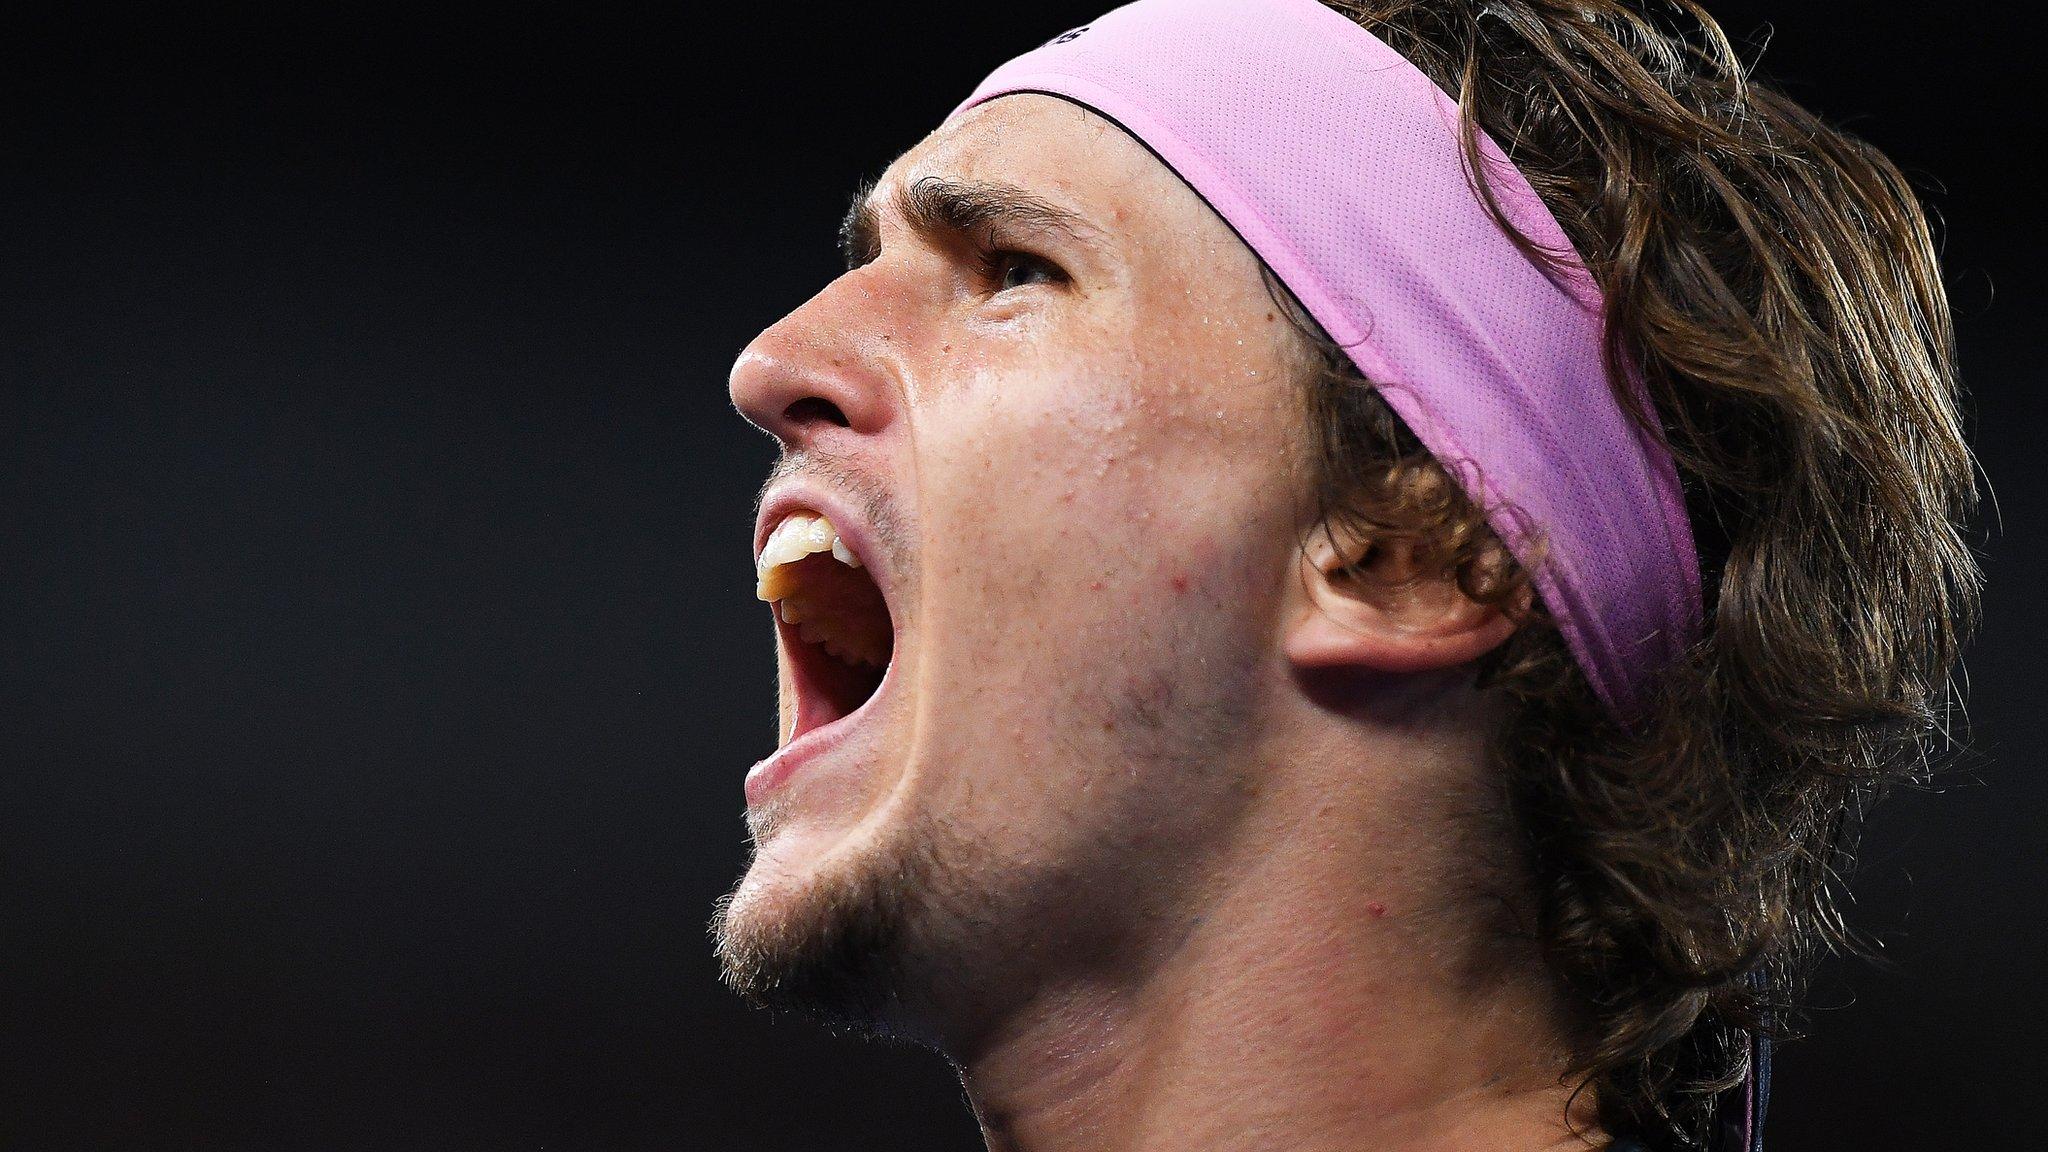 Australian Open 2019: Alexander Zverev and Kei Nishikori survive scares to progress